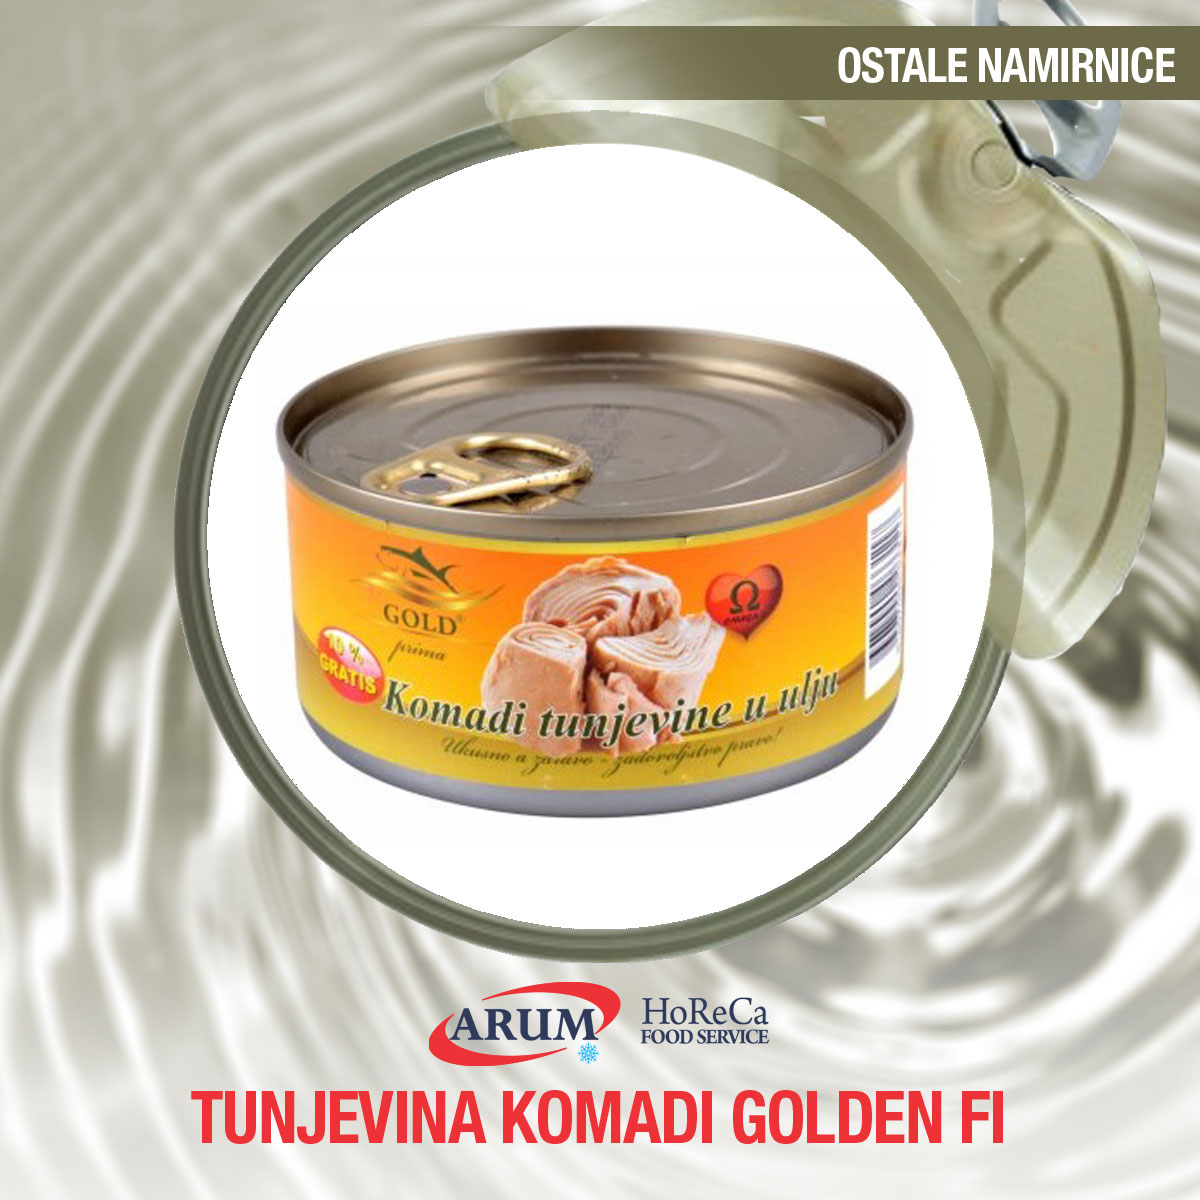 Tunjevina komadi golden fi 170gr